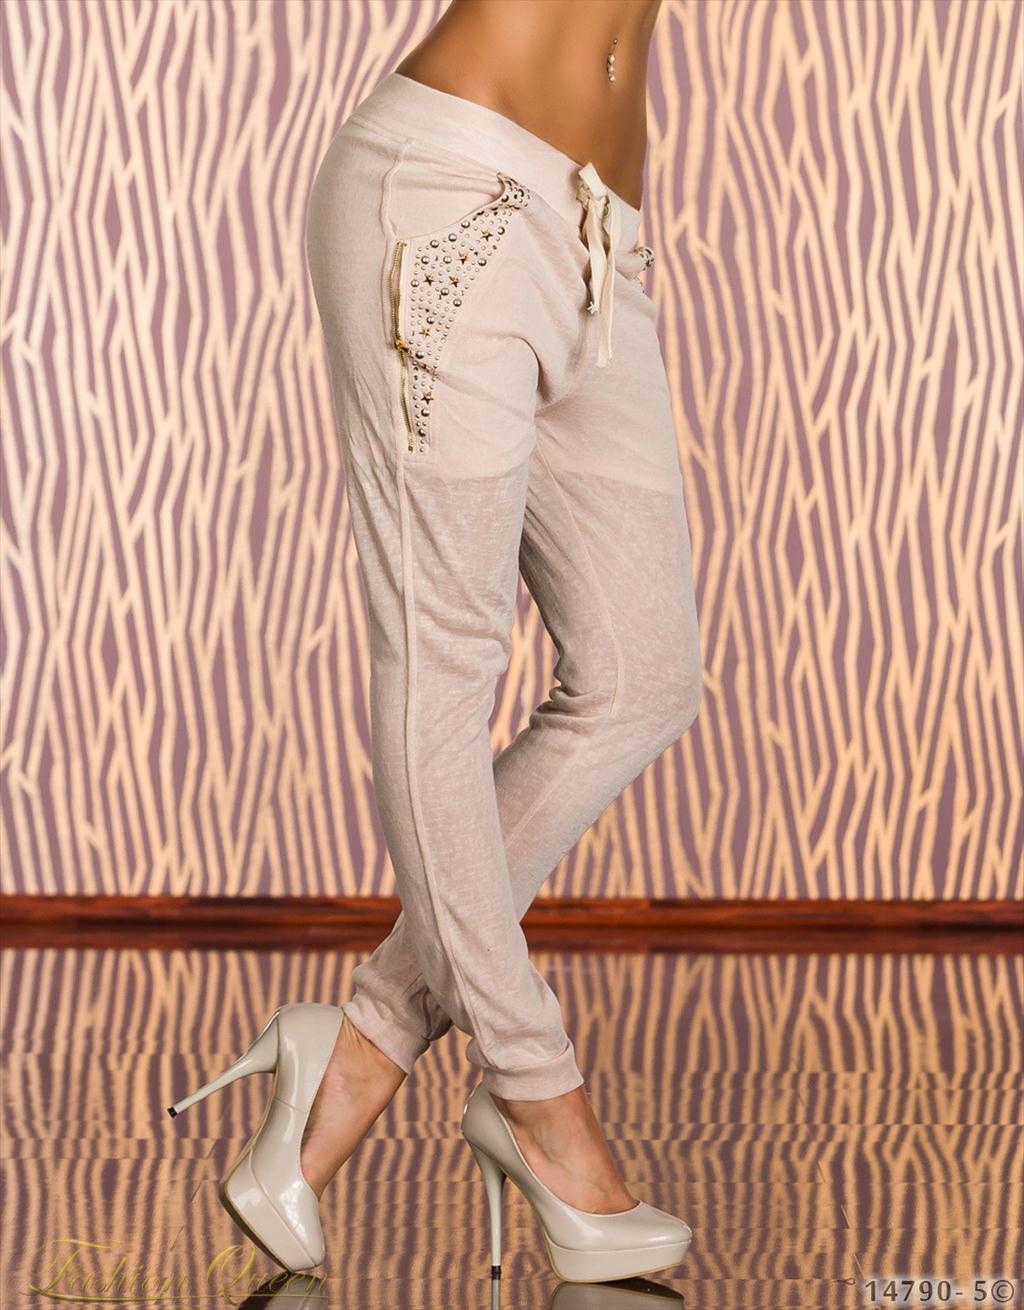 e7ee730d6487 Fashion Queen - Dámske oblečenie a móda - Športové sexi nohavice ...